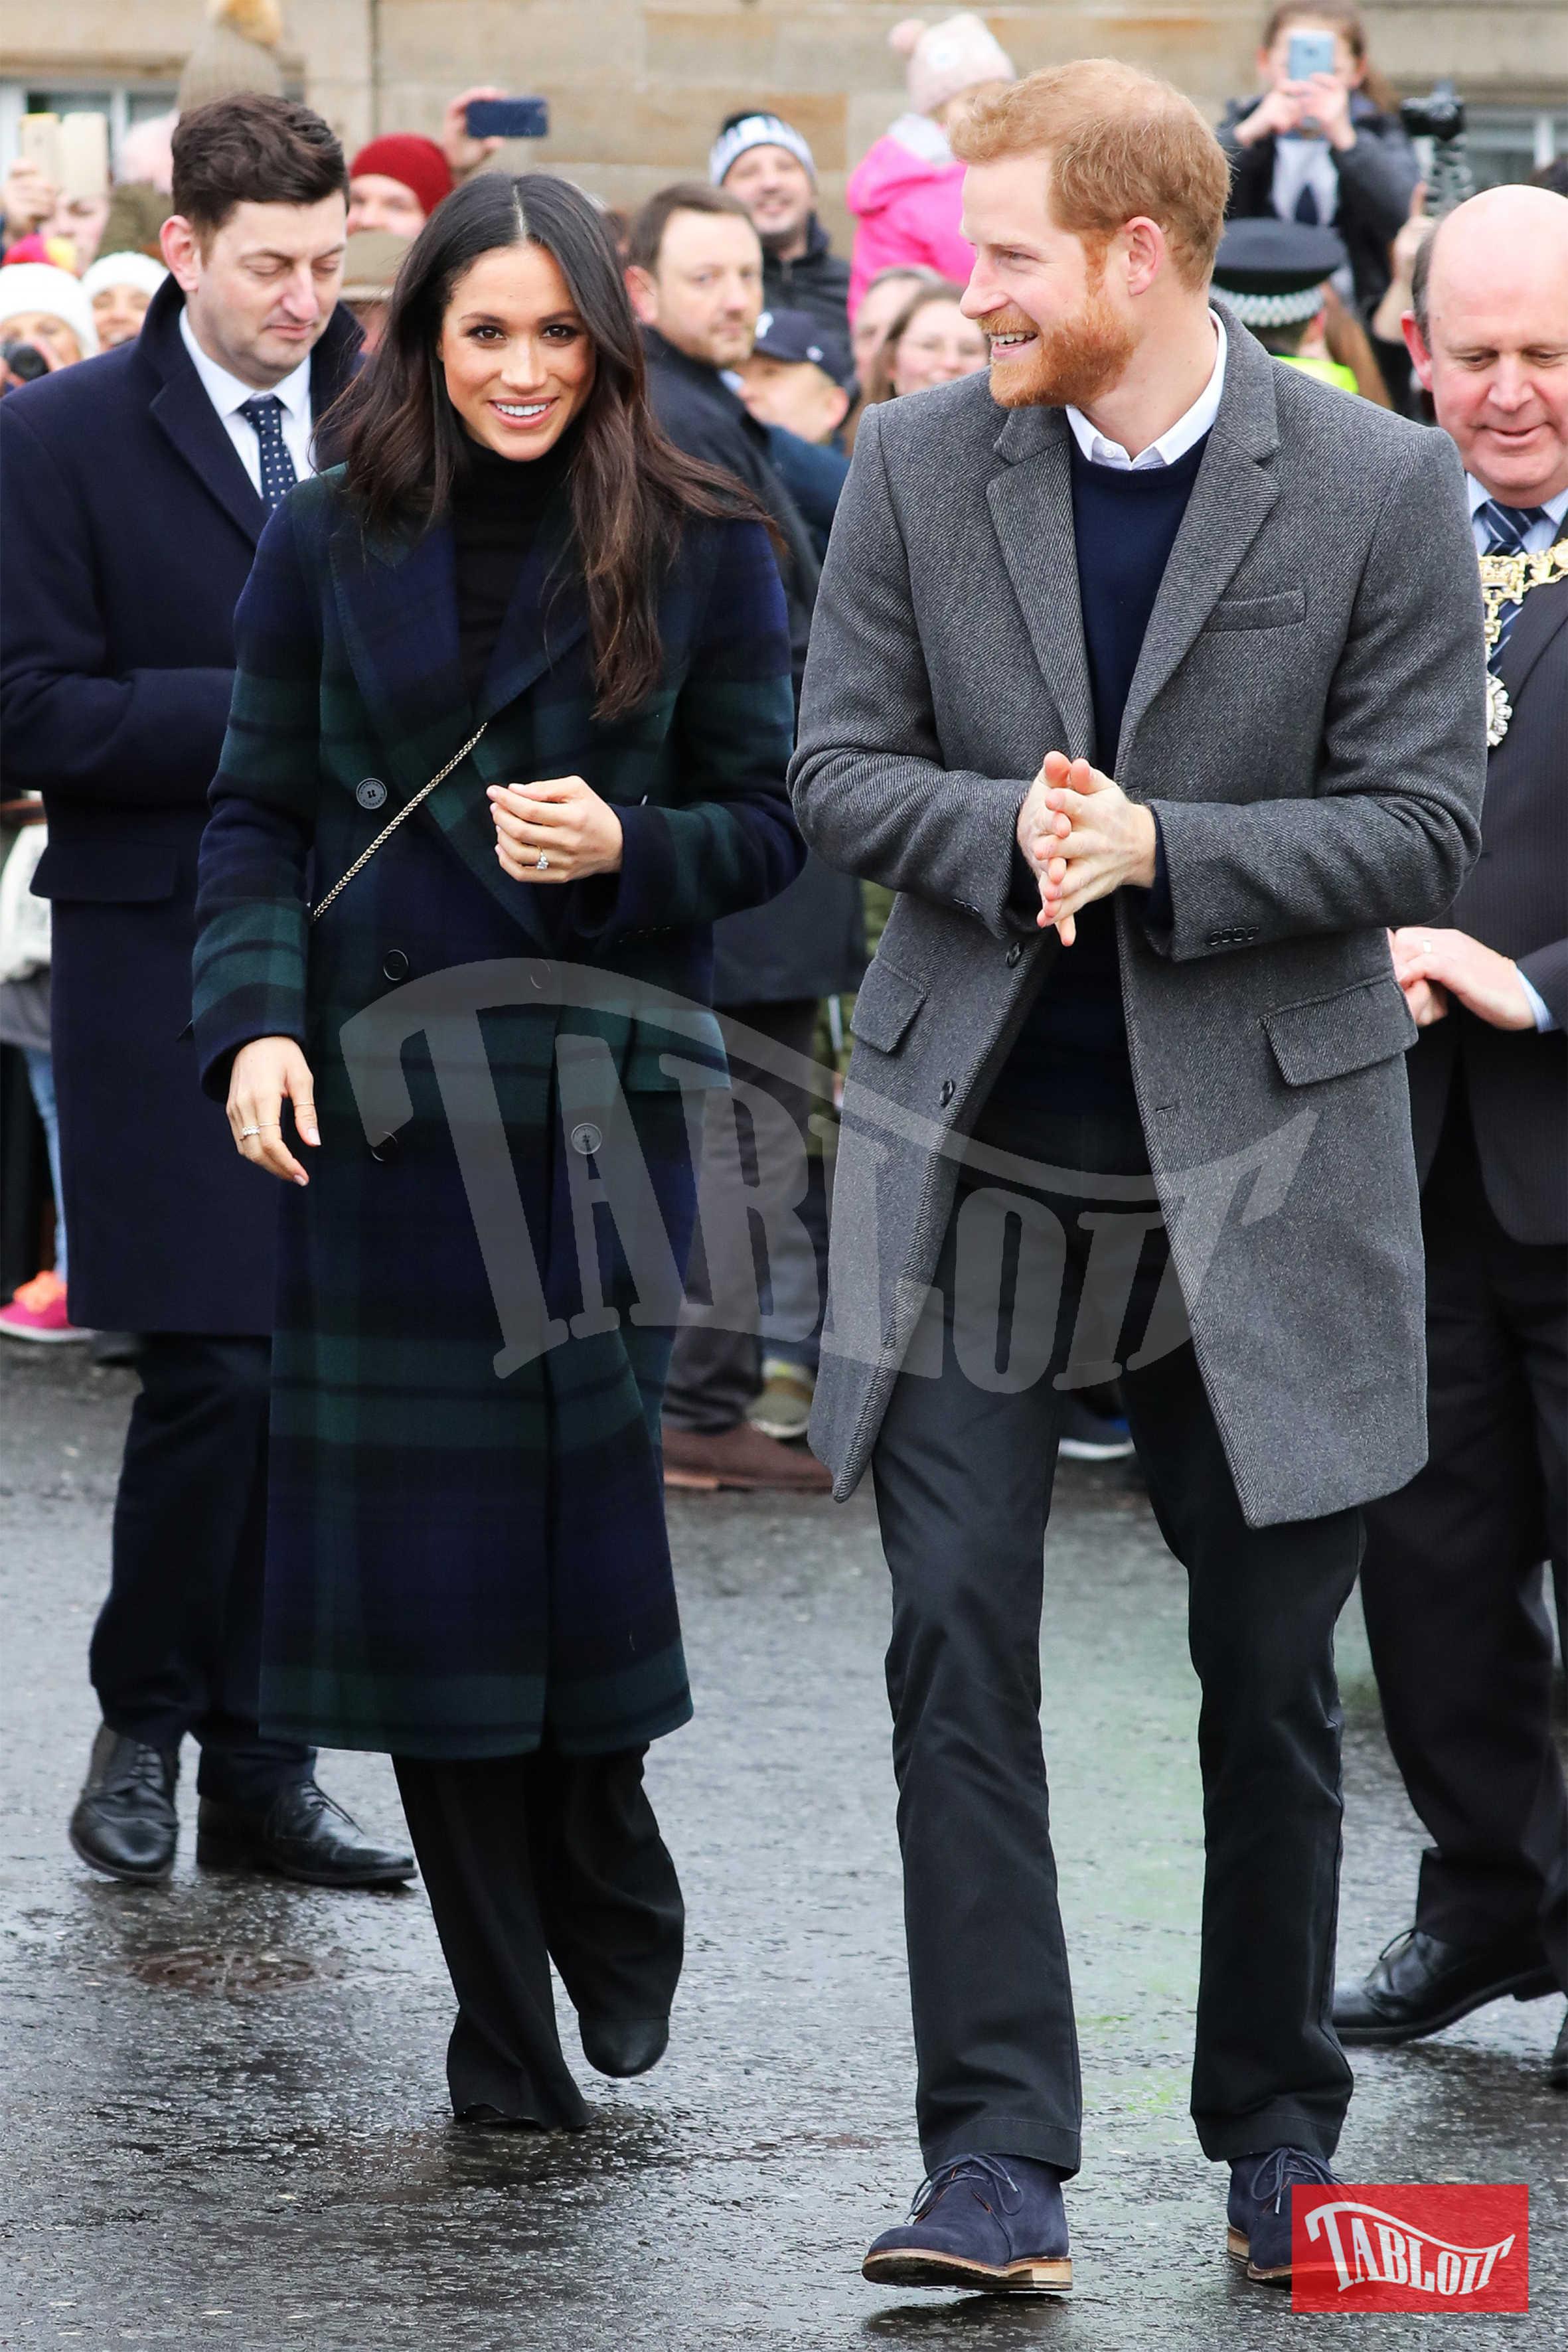 Il principe Harry e Meghan Markle